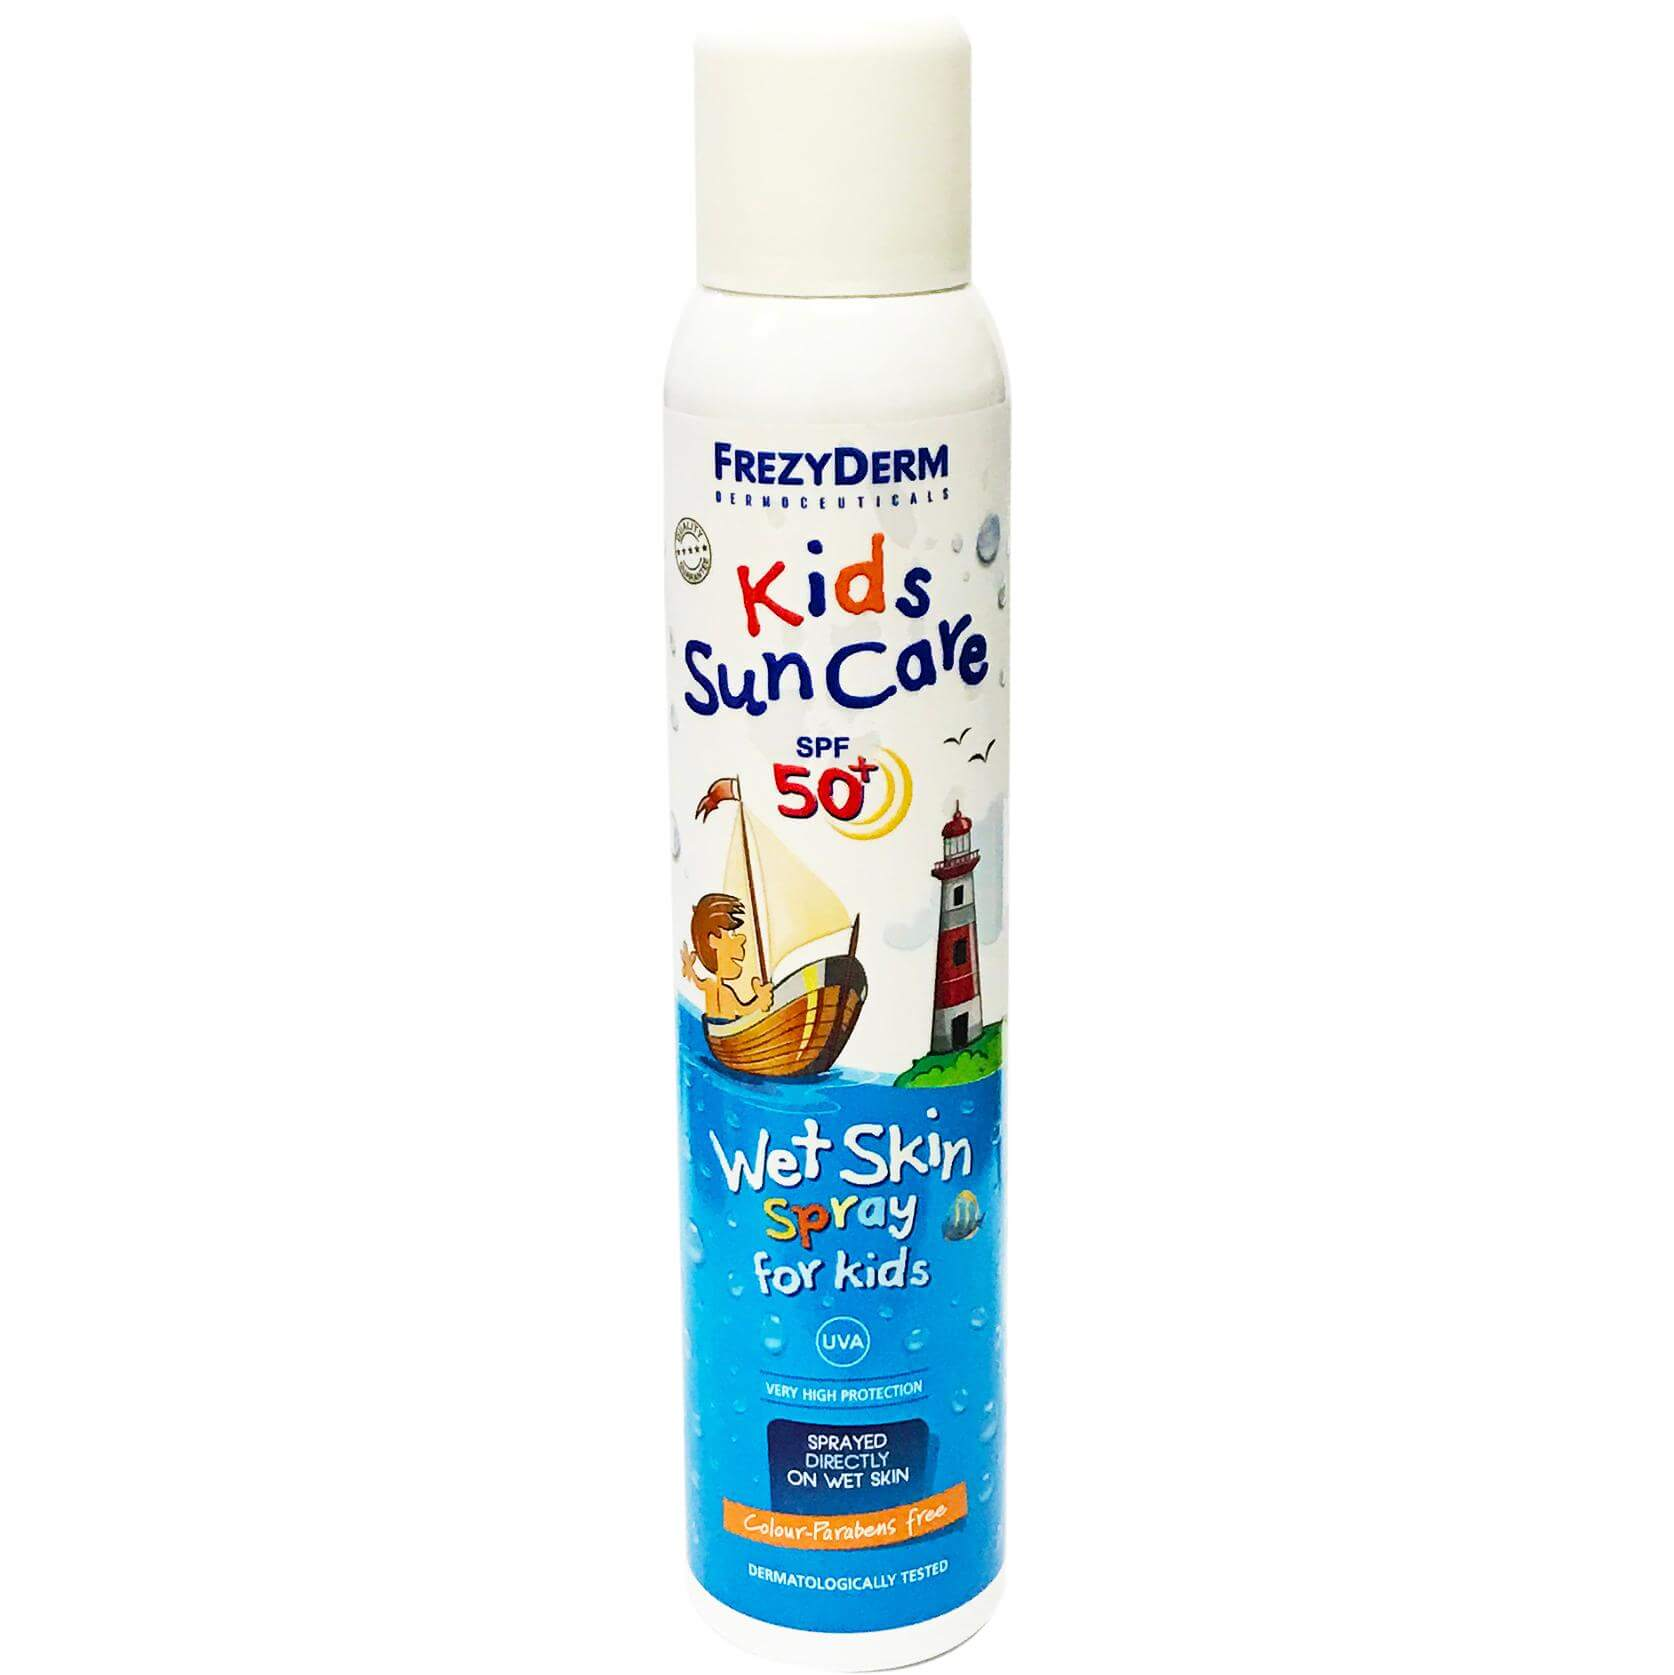 Frezyderm Kids Sun Care Water Skin Spf50+ Παιδικό Αντηλιακό Σπρέυγια Απευθείας Ψεκασμό σε Βρεγμένο Σώμα200ml